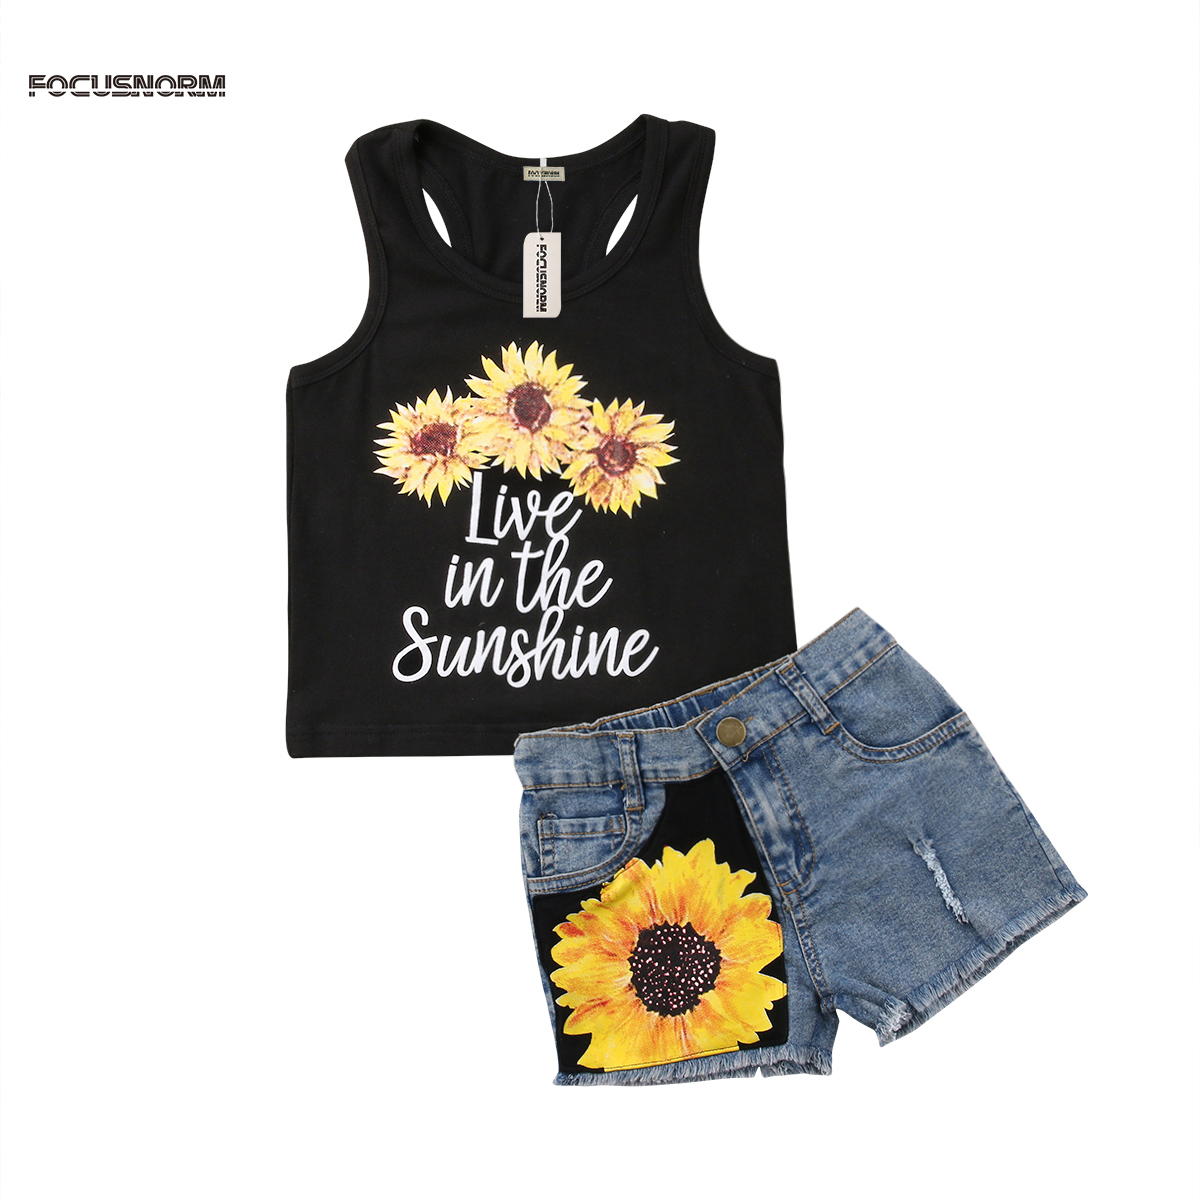 2PCS Summer Kids Baby Girl Sleeveless Tank Top T Shirt+Denim Shorts Flower Printed Clothes Outfit Set багажник на крышу lux ваз lada priora sd 1 1м аэродинамические дуги узкие 840064